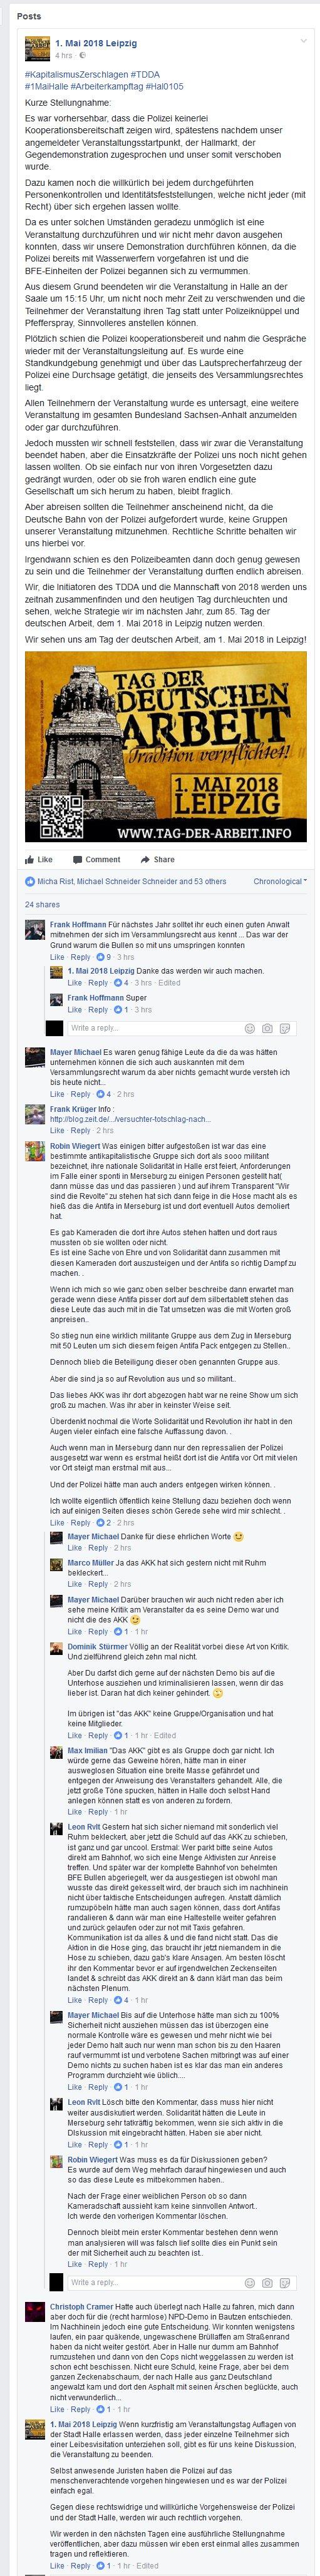 2017-05-02_18.39.14-1._Mai_2018_Leipzig_-kurze Stellungnahme_-_.jpg